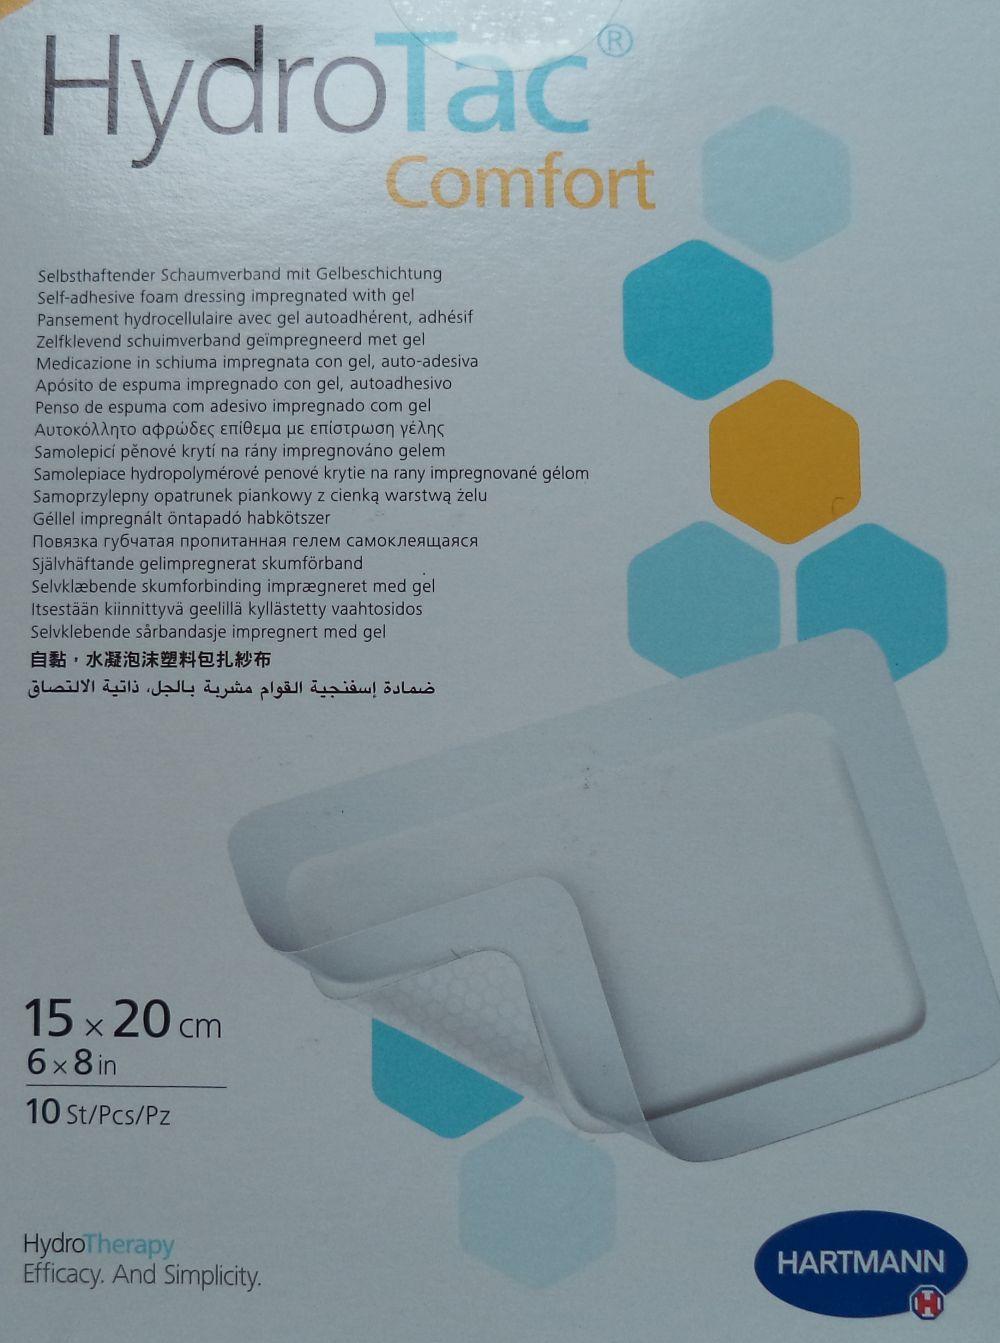 HydroTac Comfort 15cm x 20cm Schaumverband